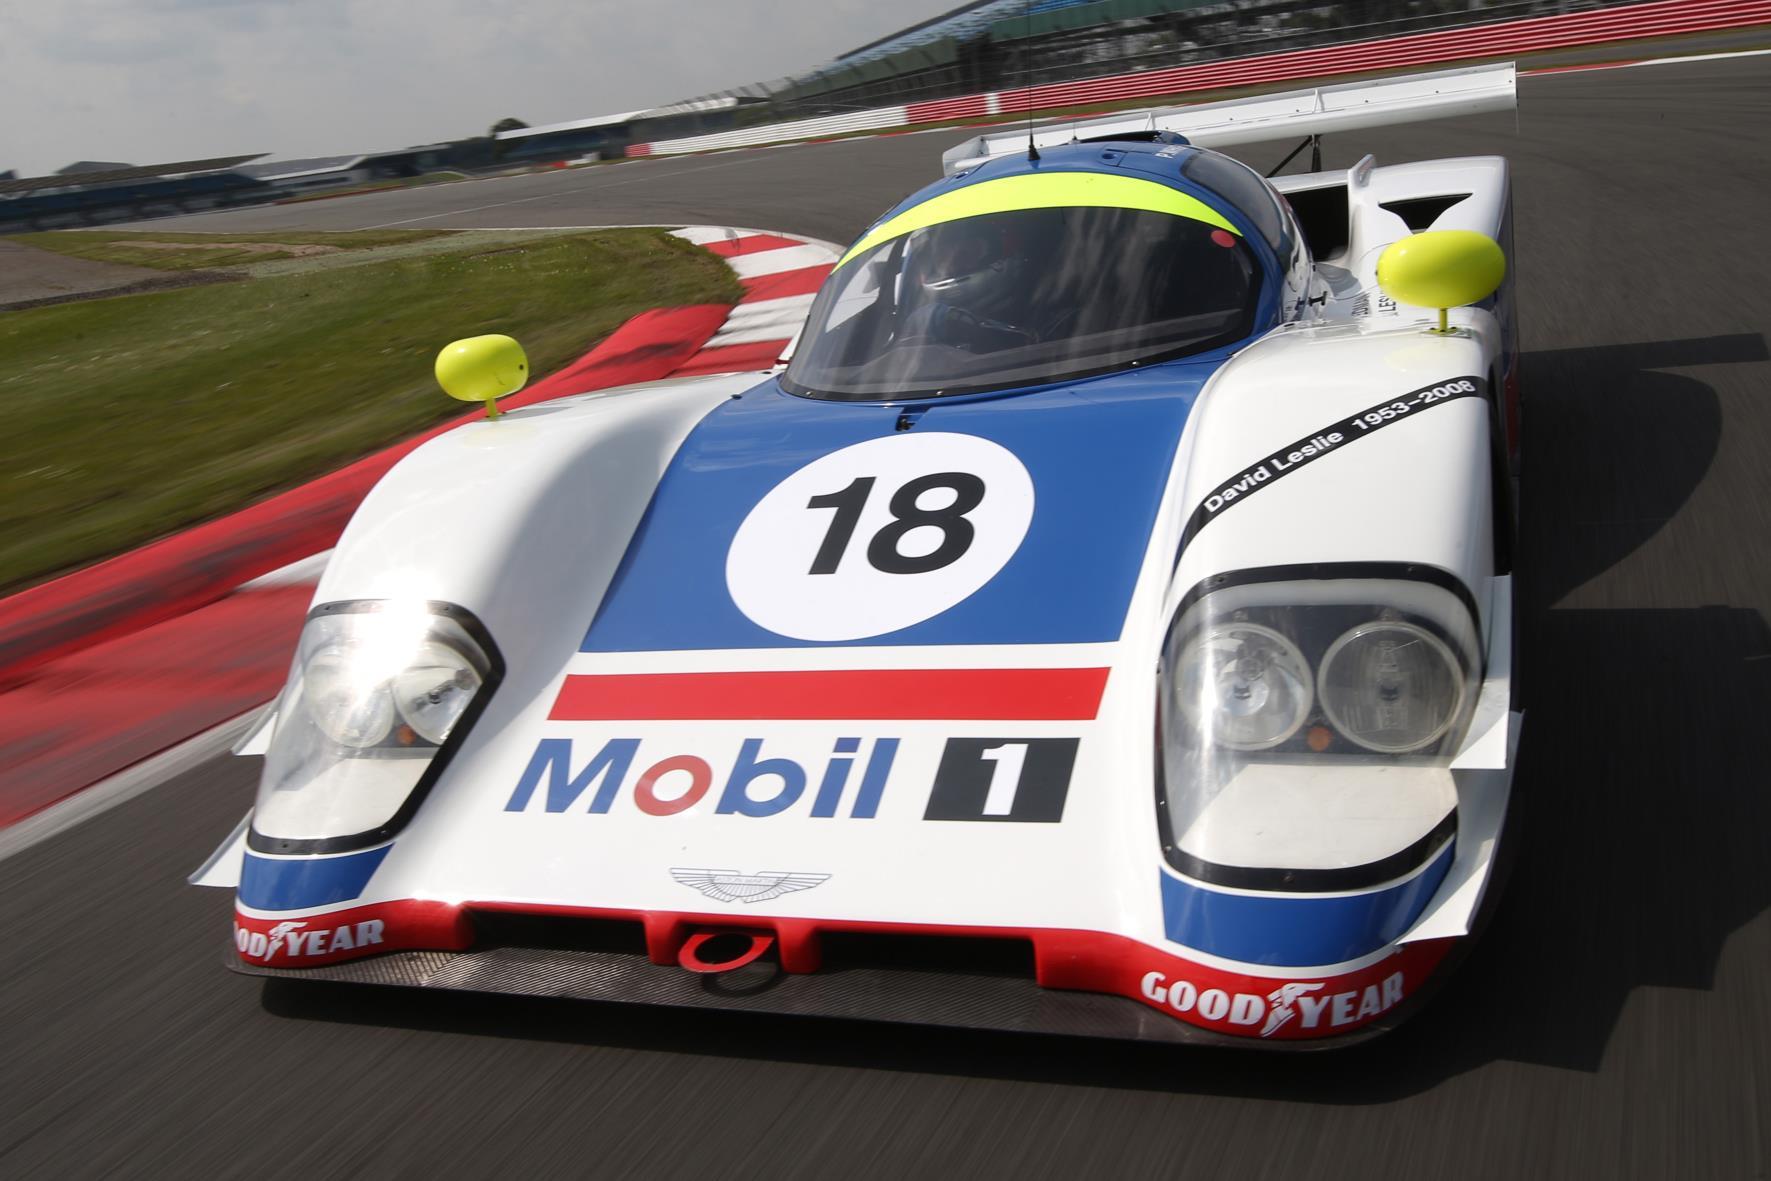 1989 Aston Martin Group C racecar to headline sale at Race Retro